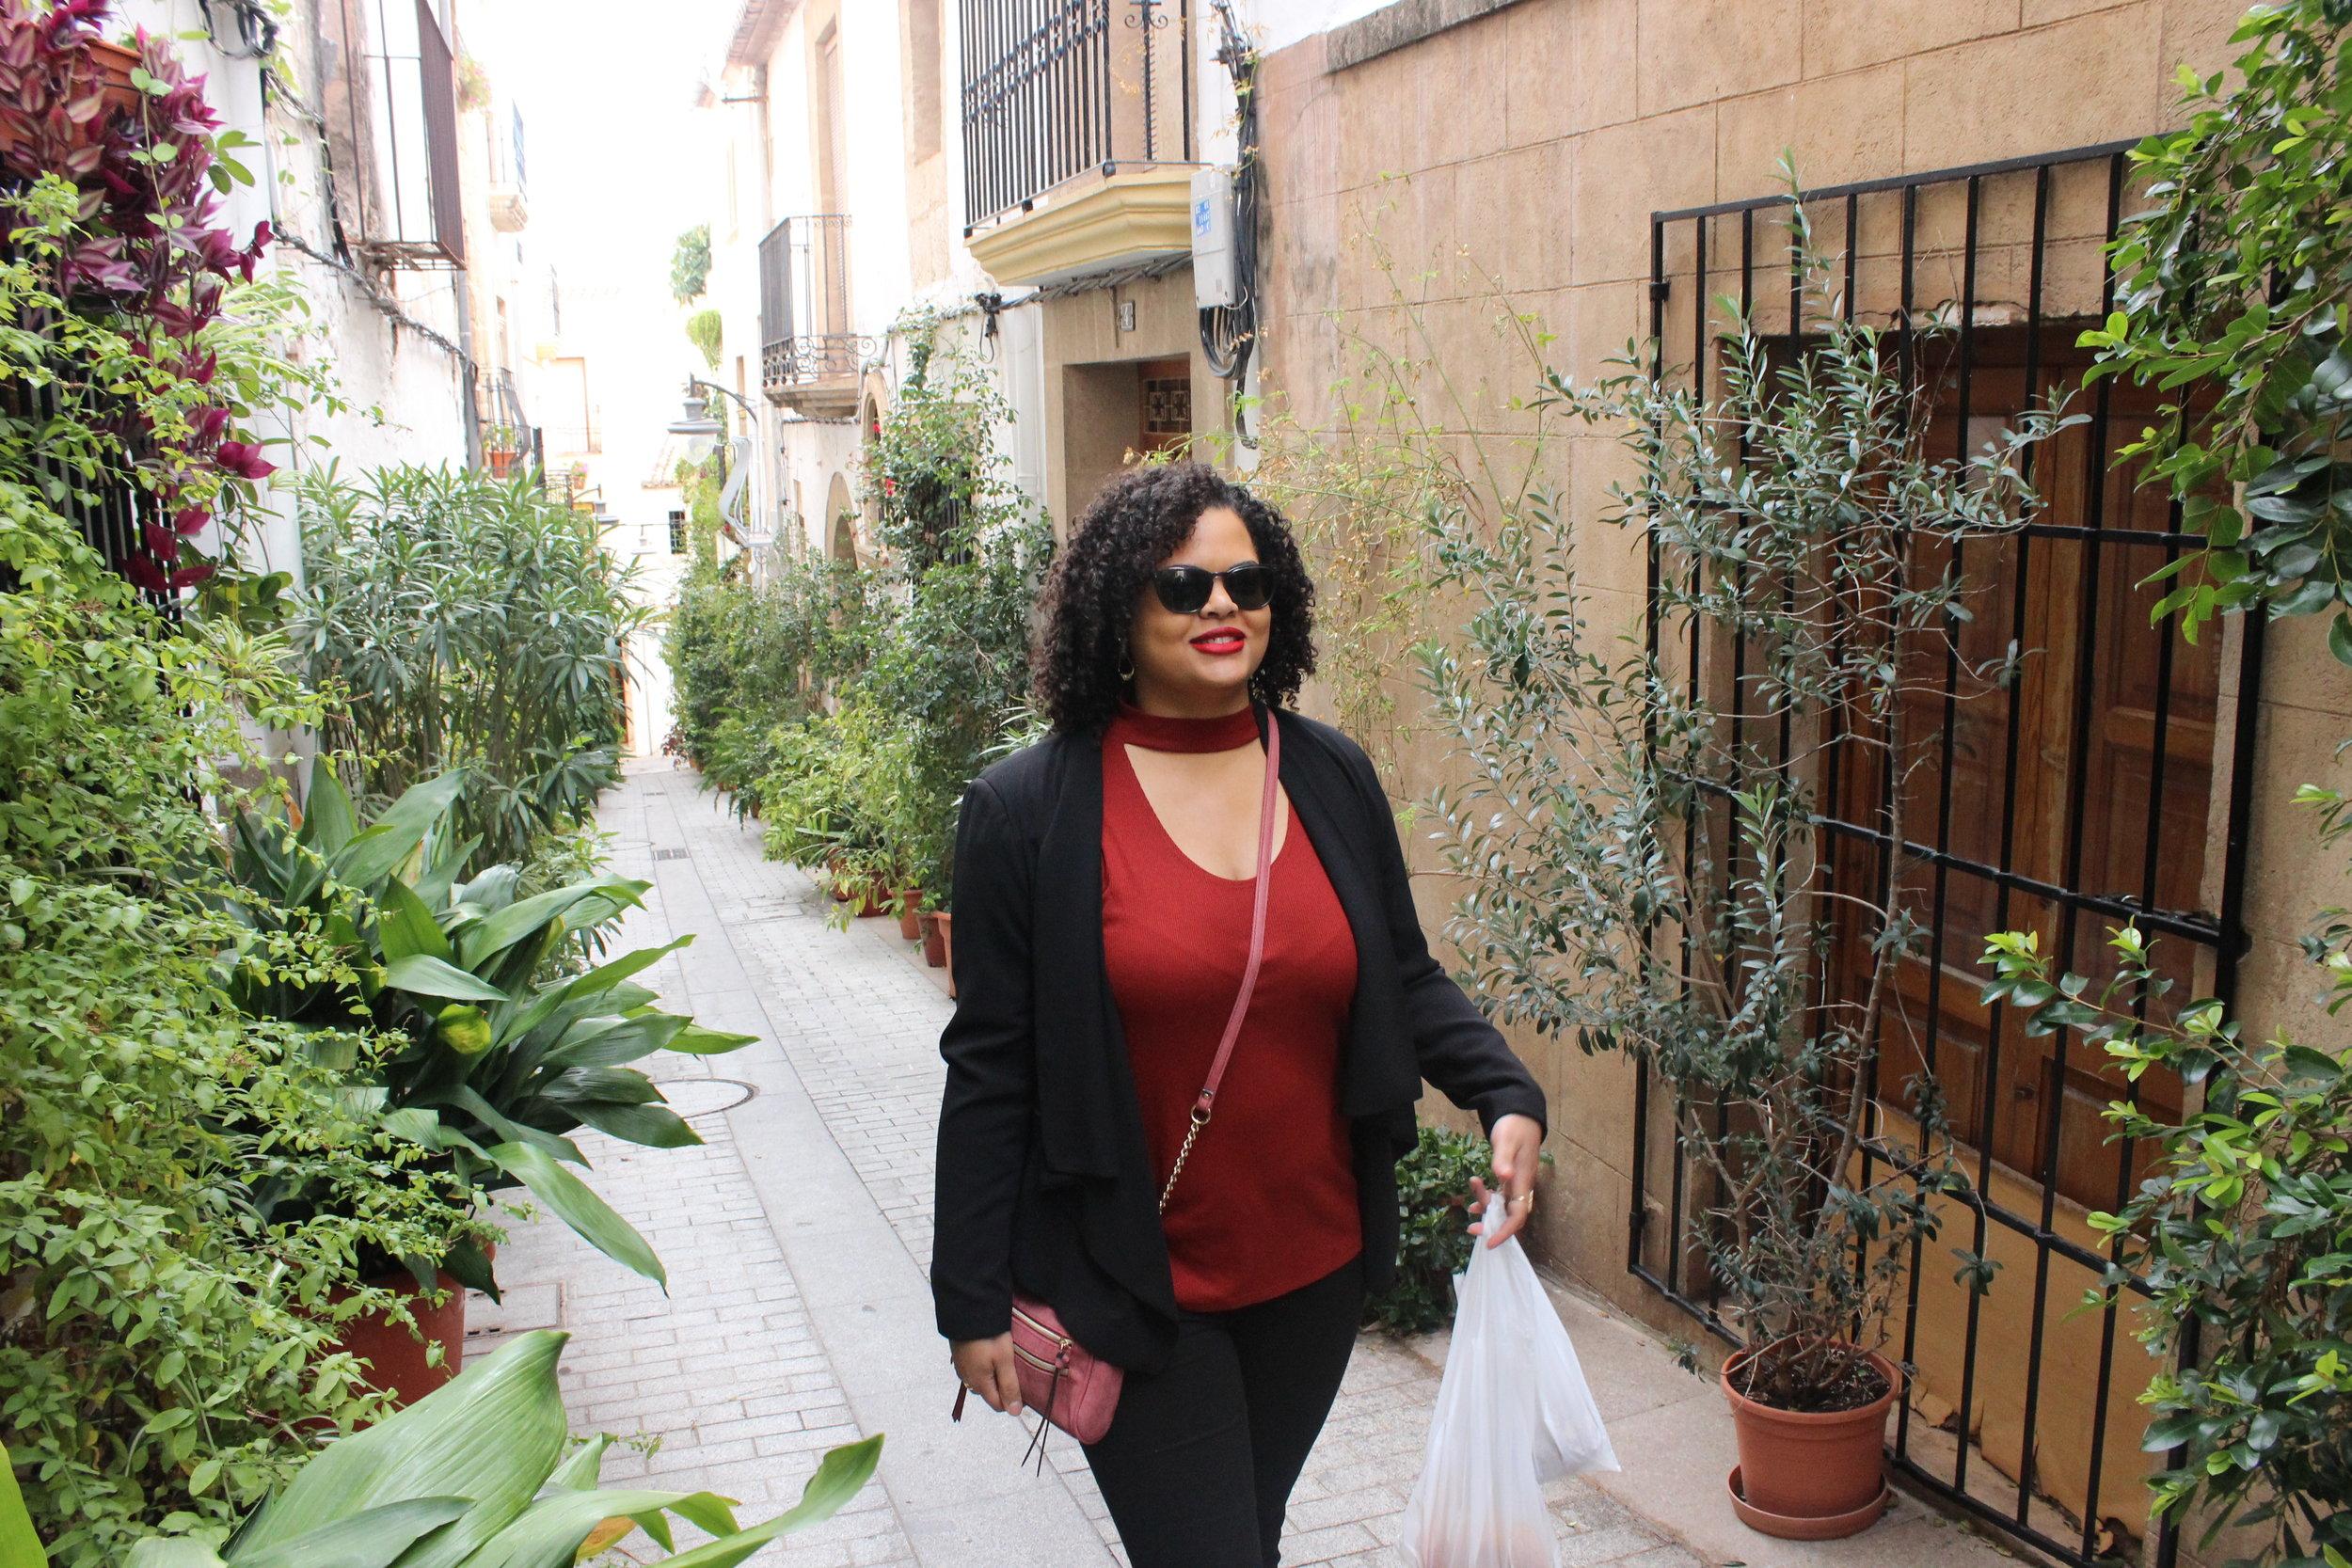 Walking through downtown Jávea, Spain